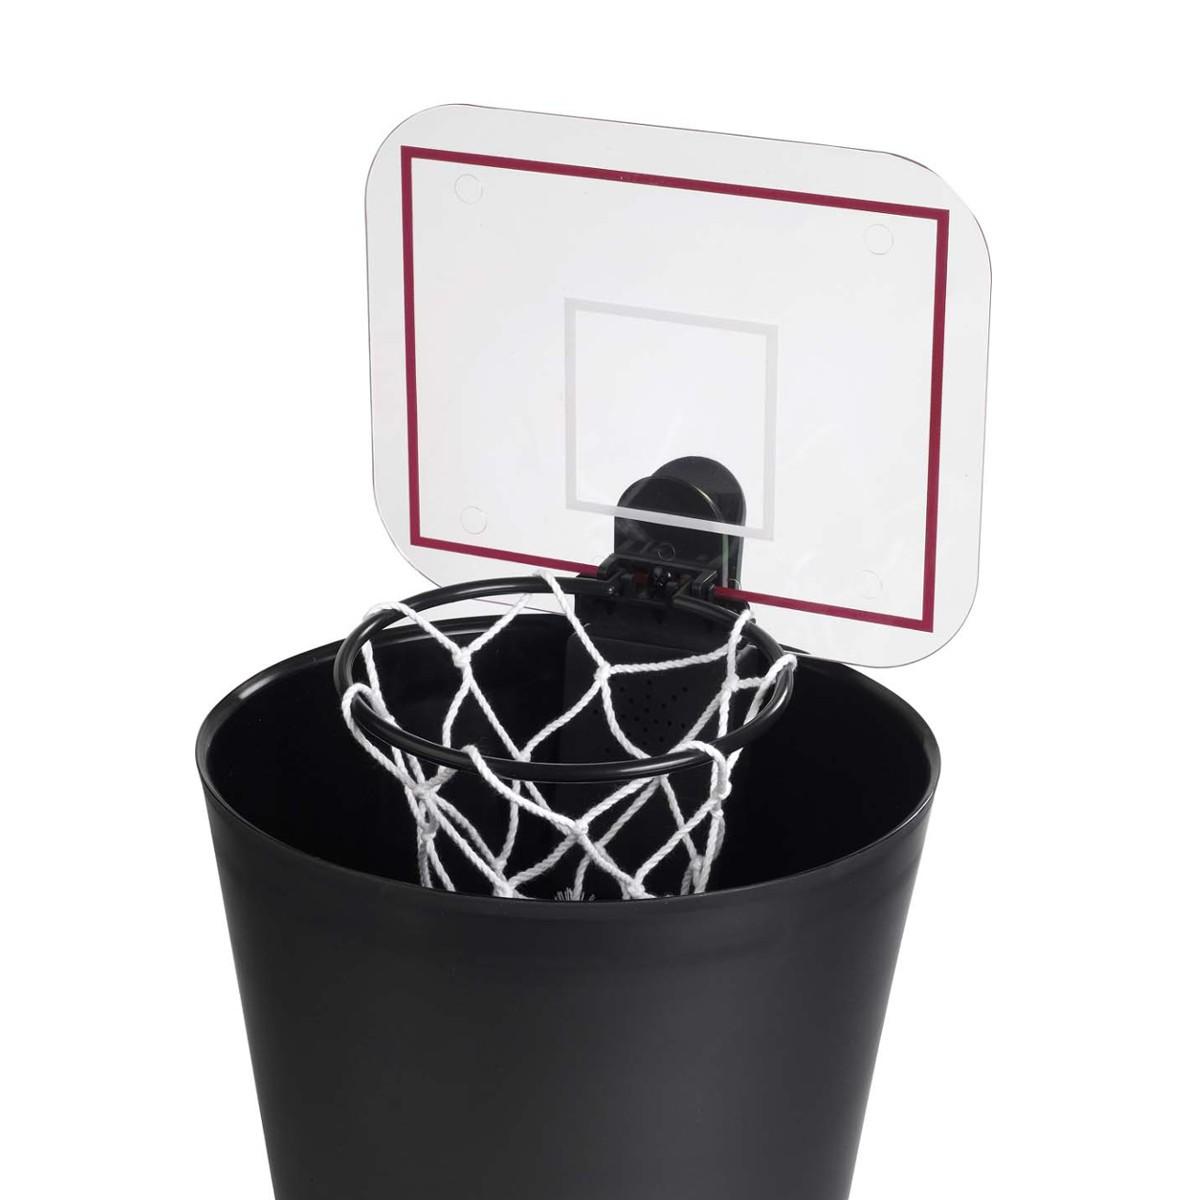 Papierkorb-Basketball - mit Sound!